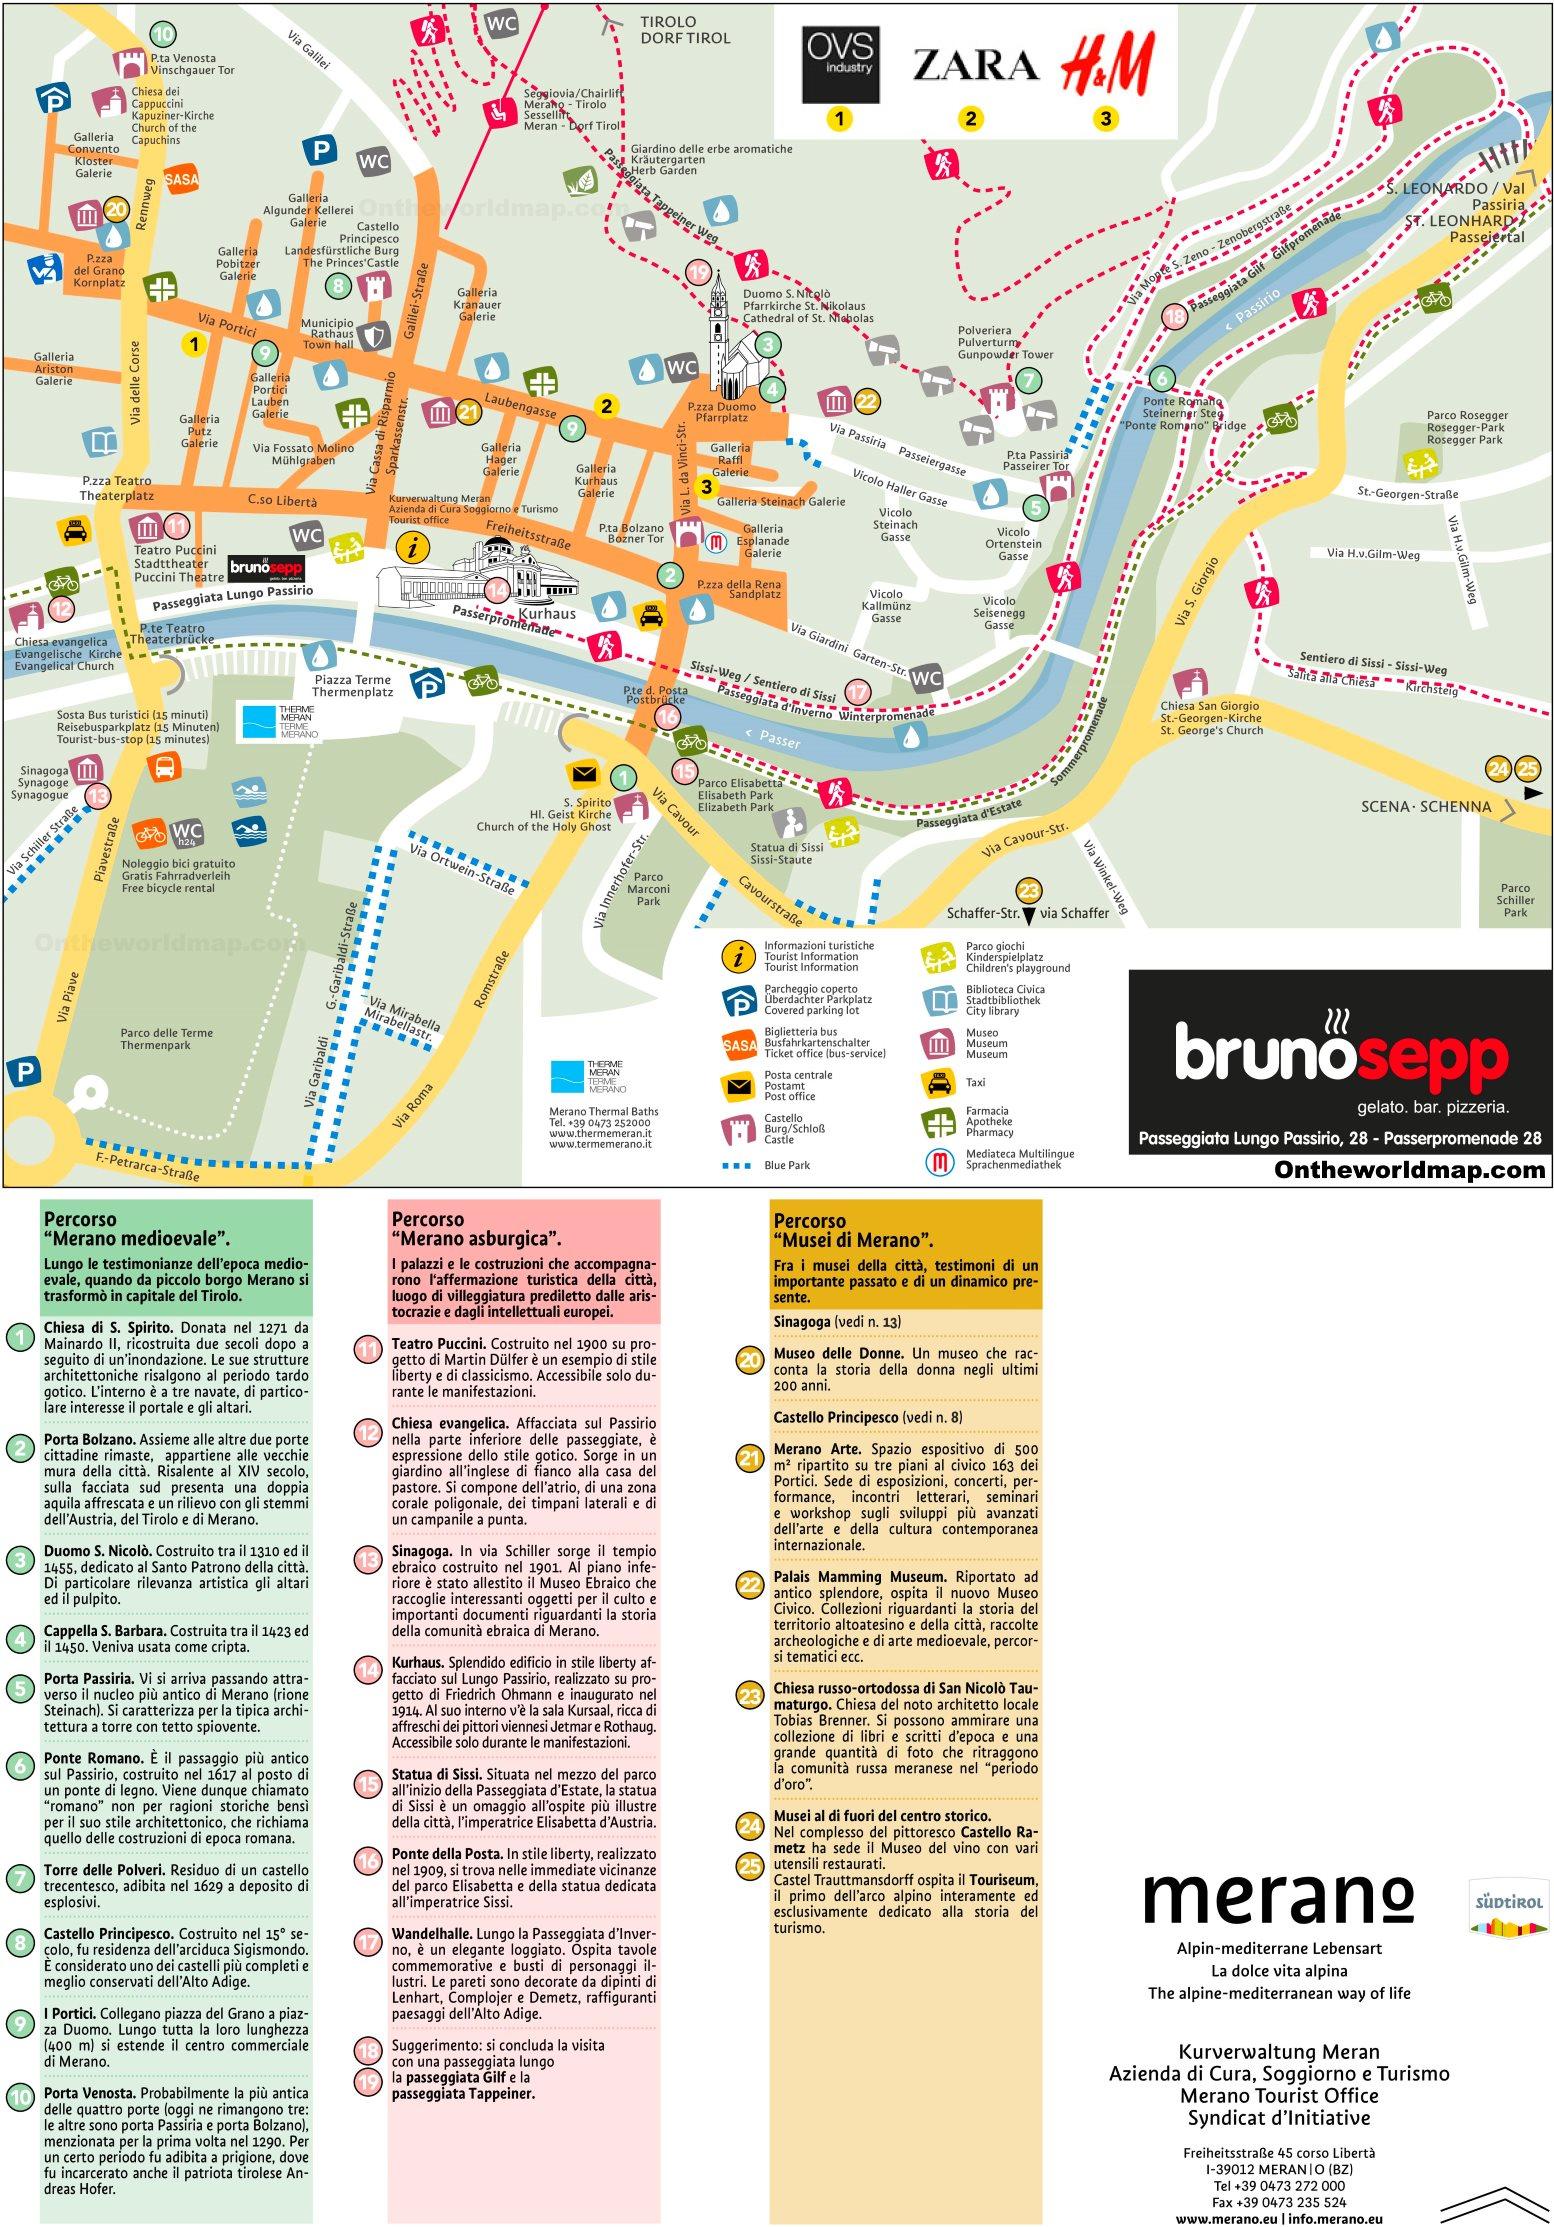 Cartina Parigi Con Punti Di Interesse